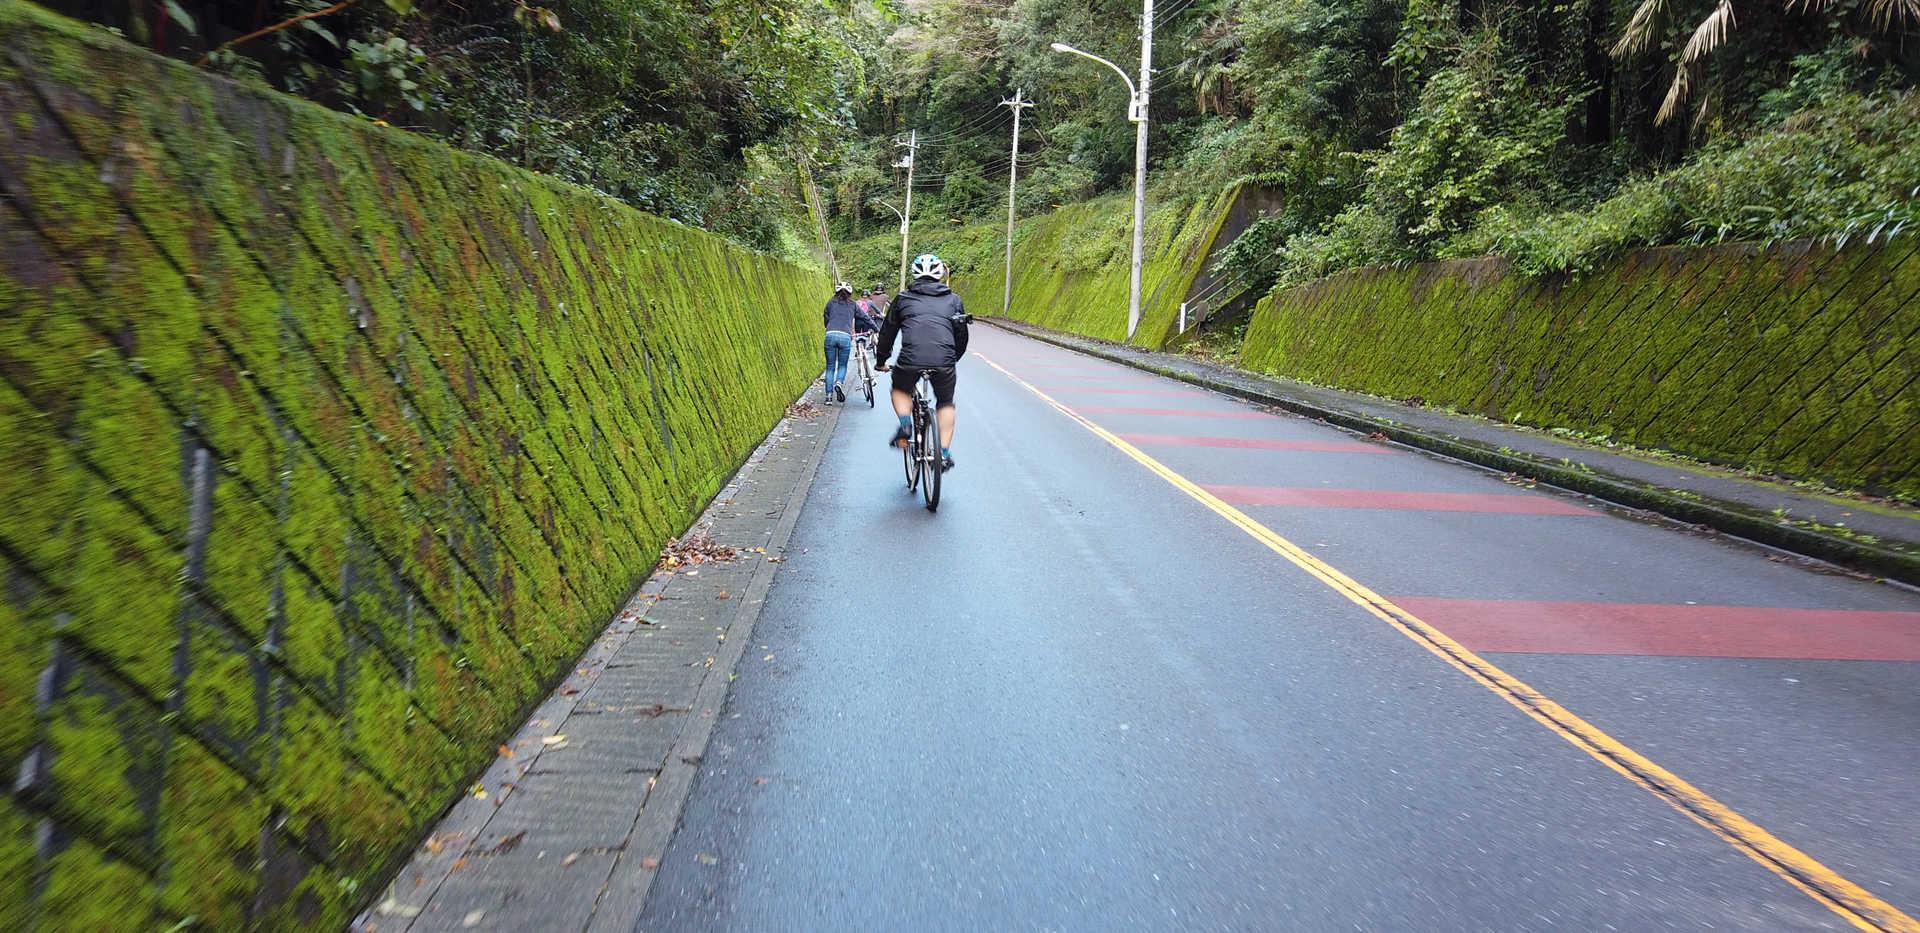 Ome_Cycling_02.JPG